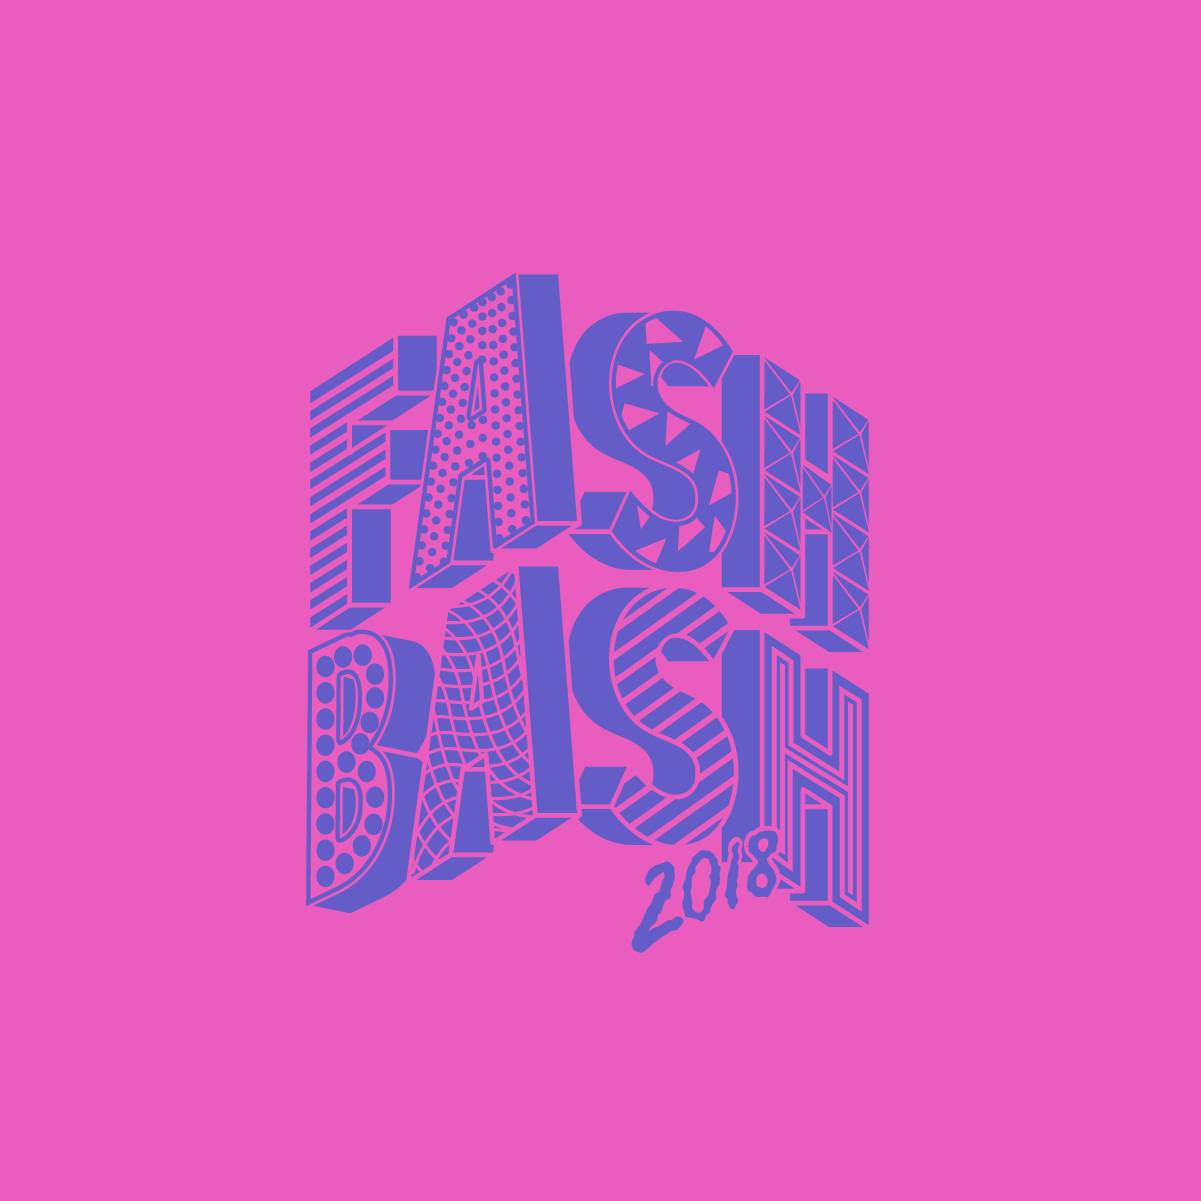 FashBash_headers_03-02